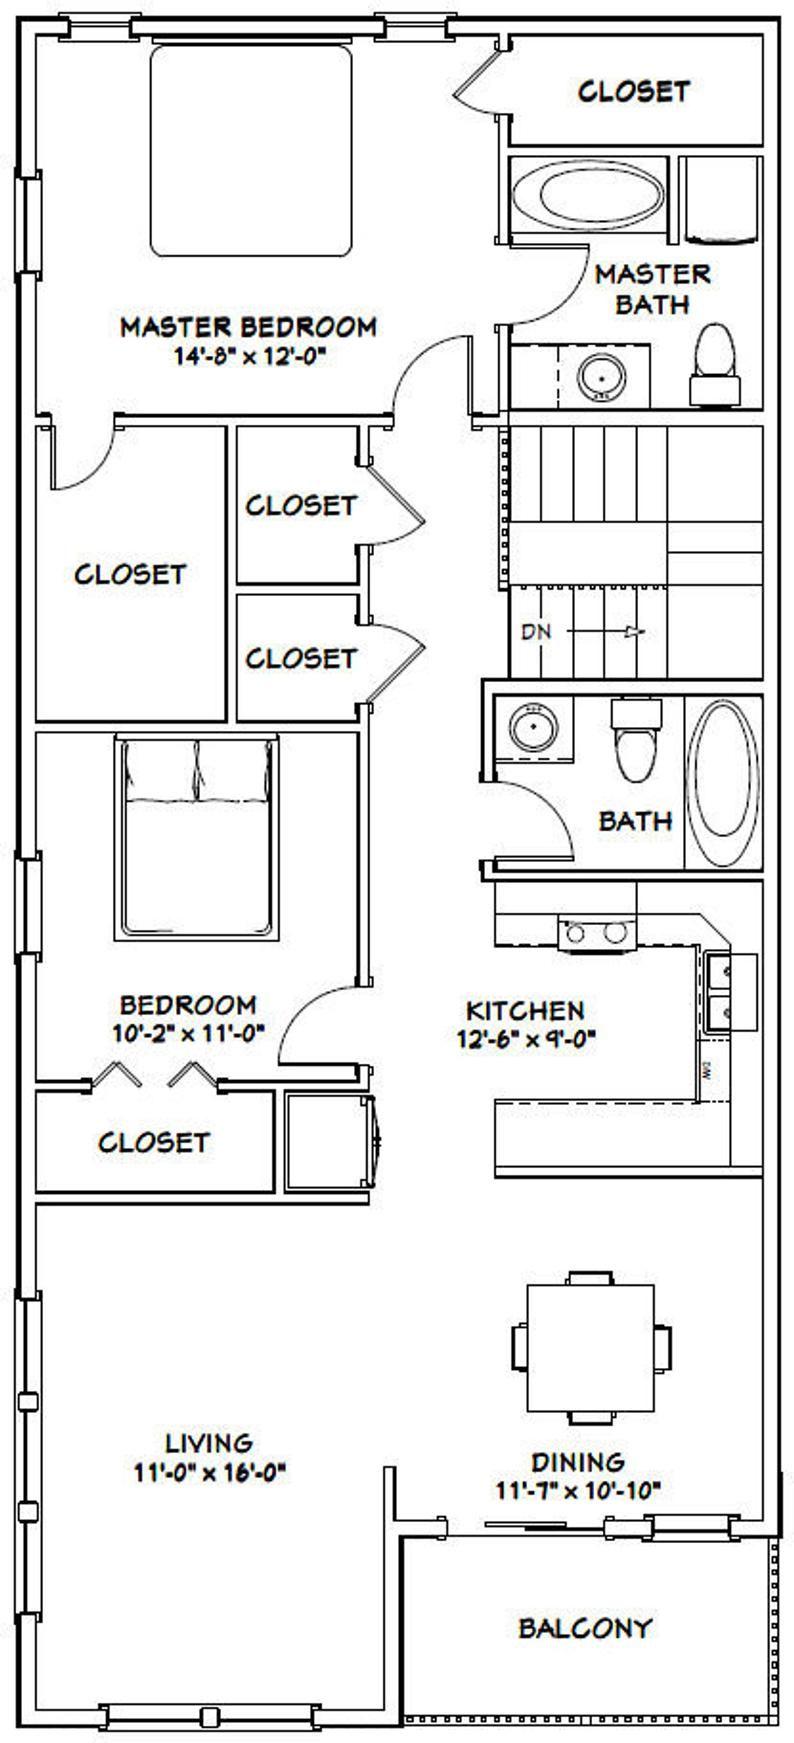 60x48 House 2Bedroom 2.5Bath 1604 sq ft PDF Floor Etsy